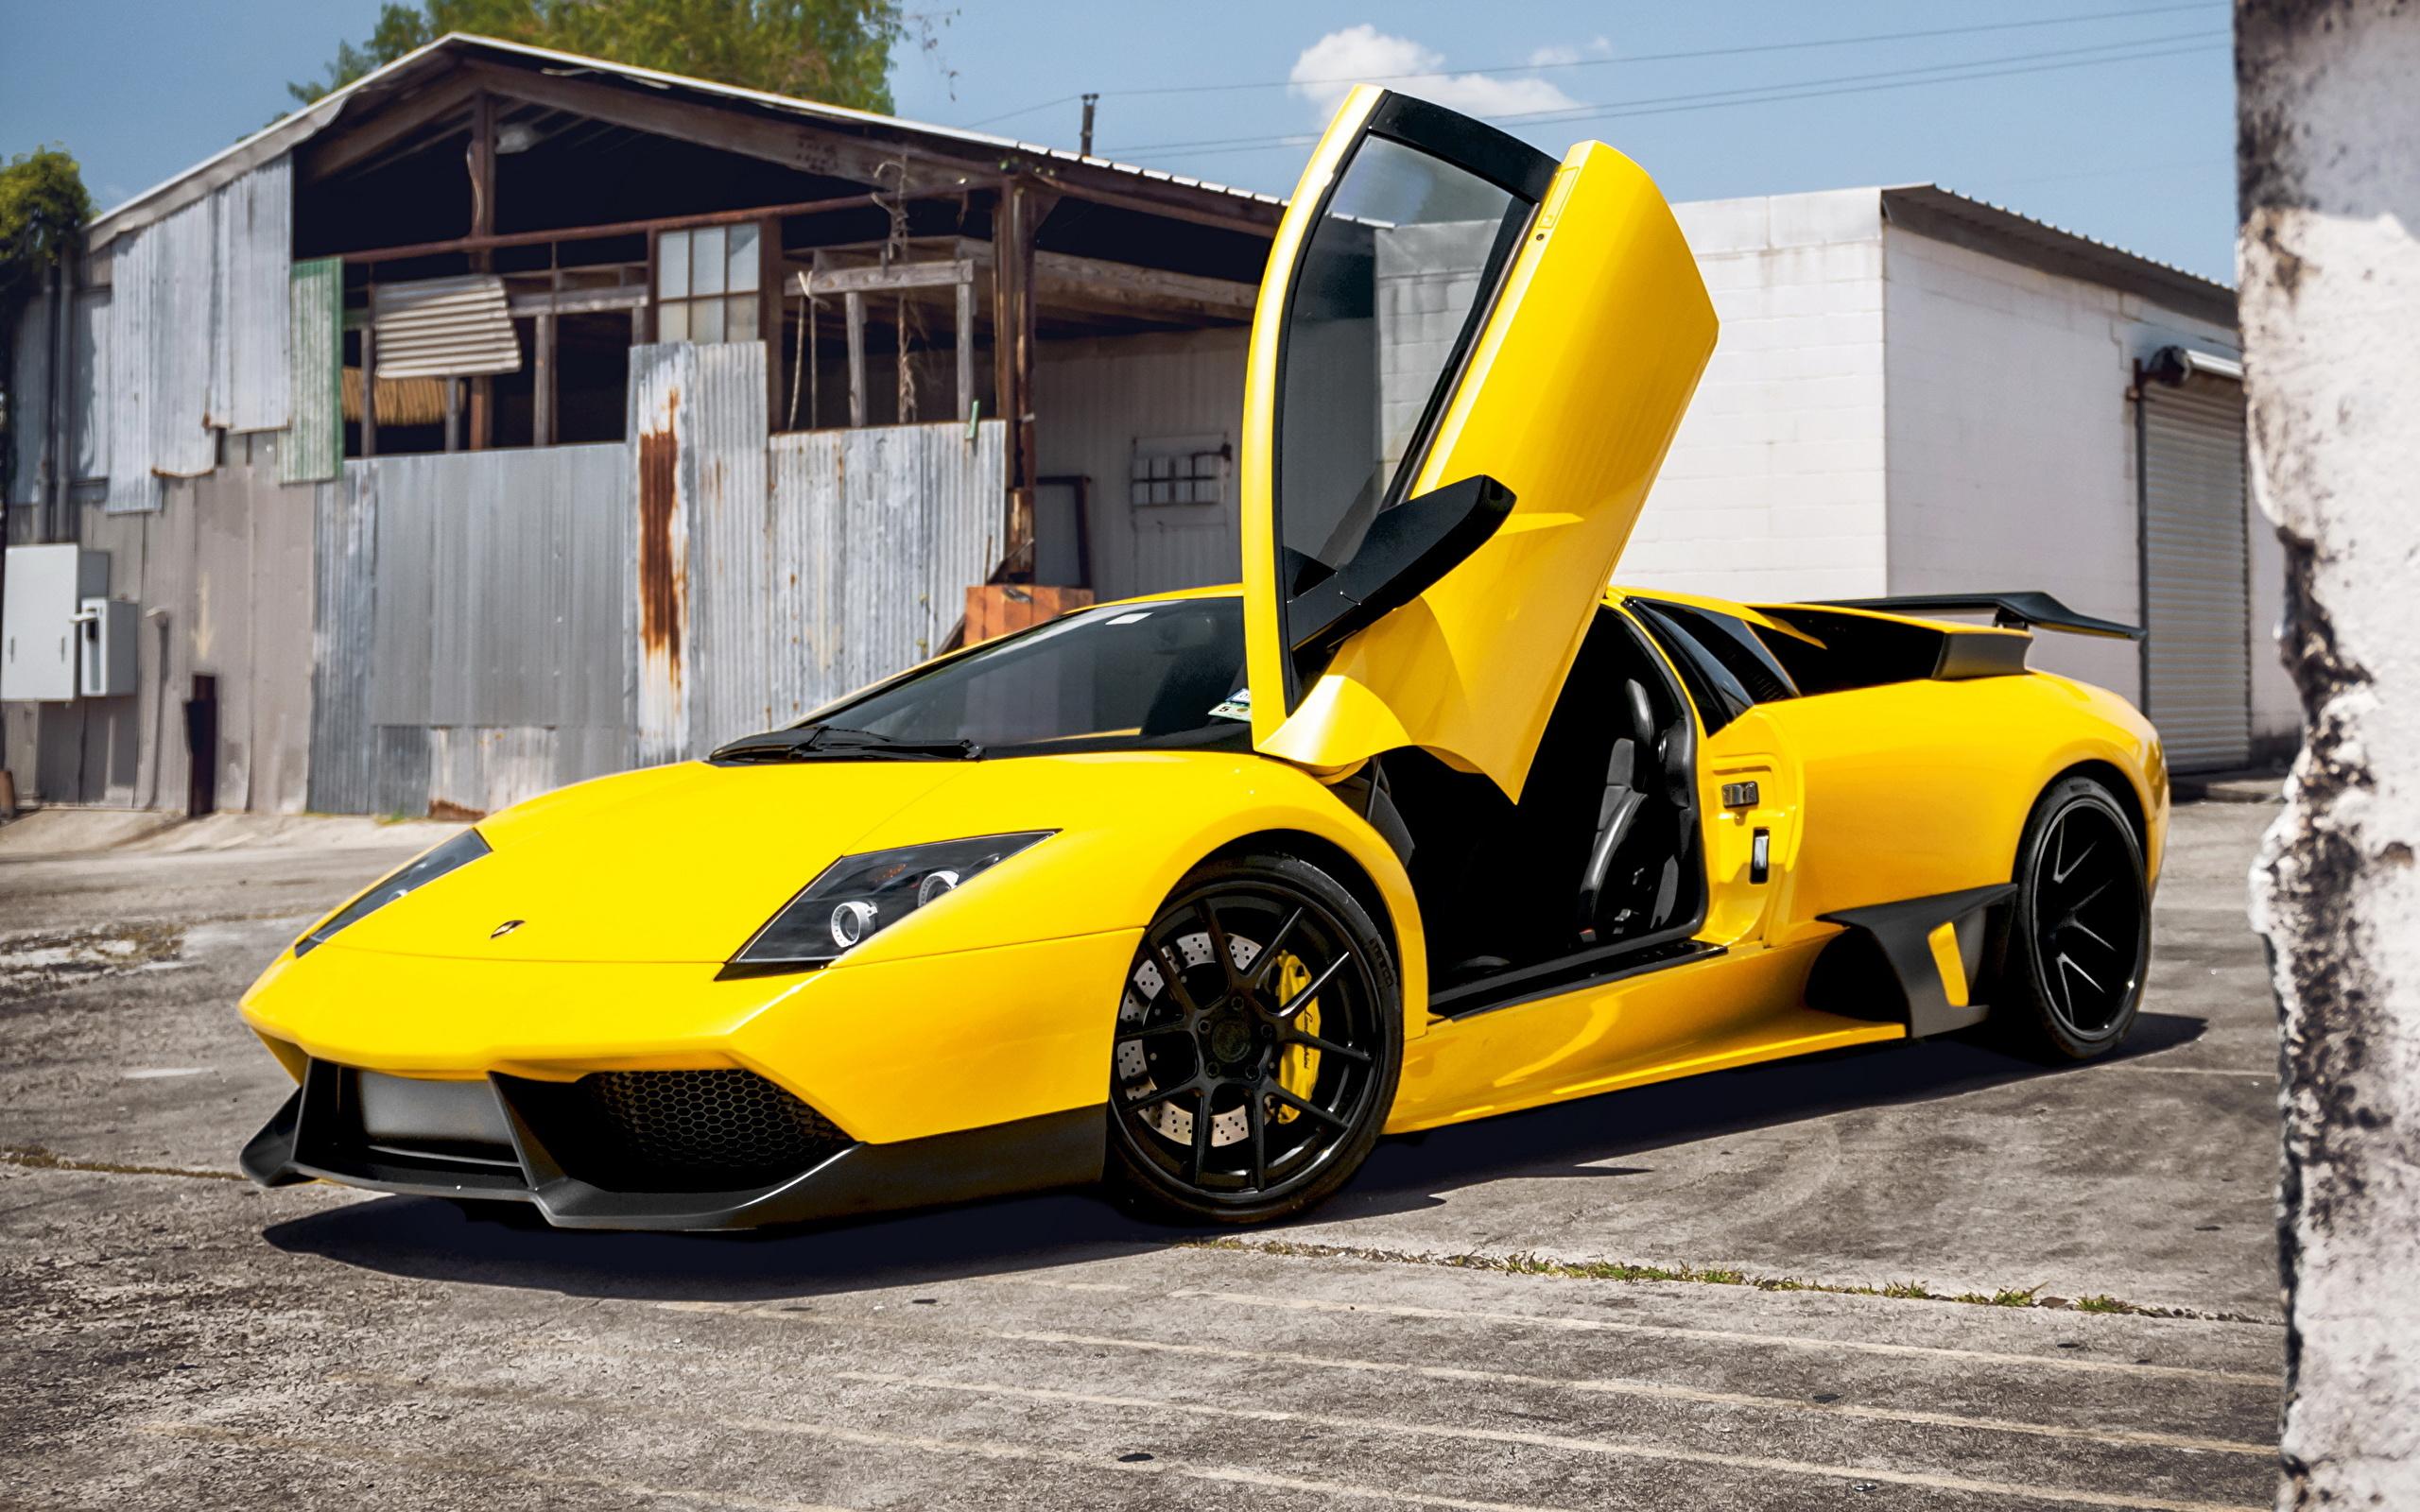 Yellow Lamborghini Murcielago Wallpaper Wallpapersafari